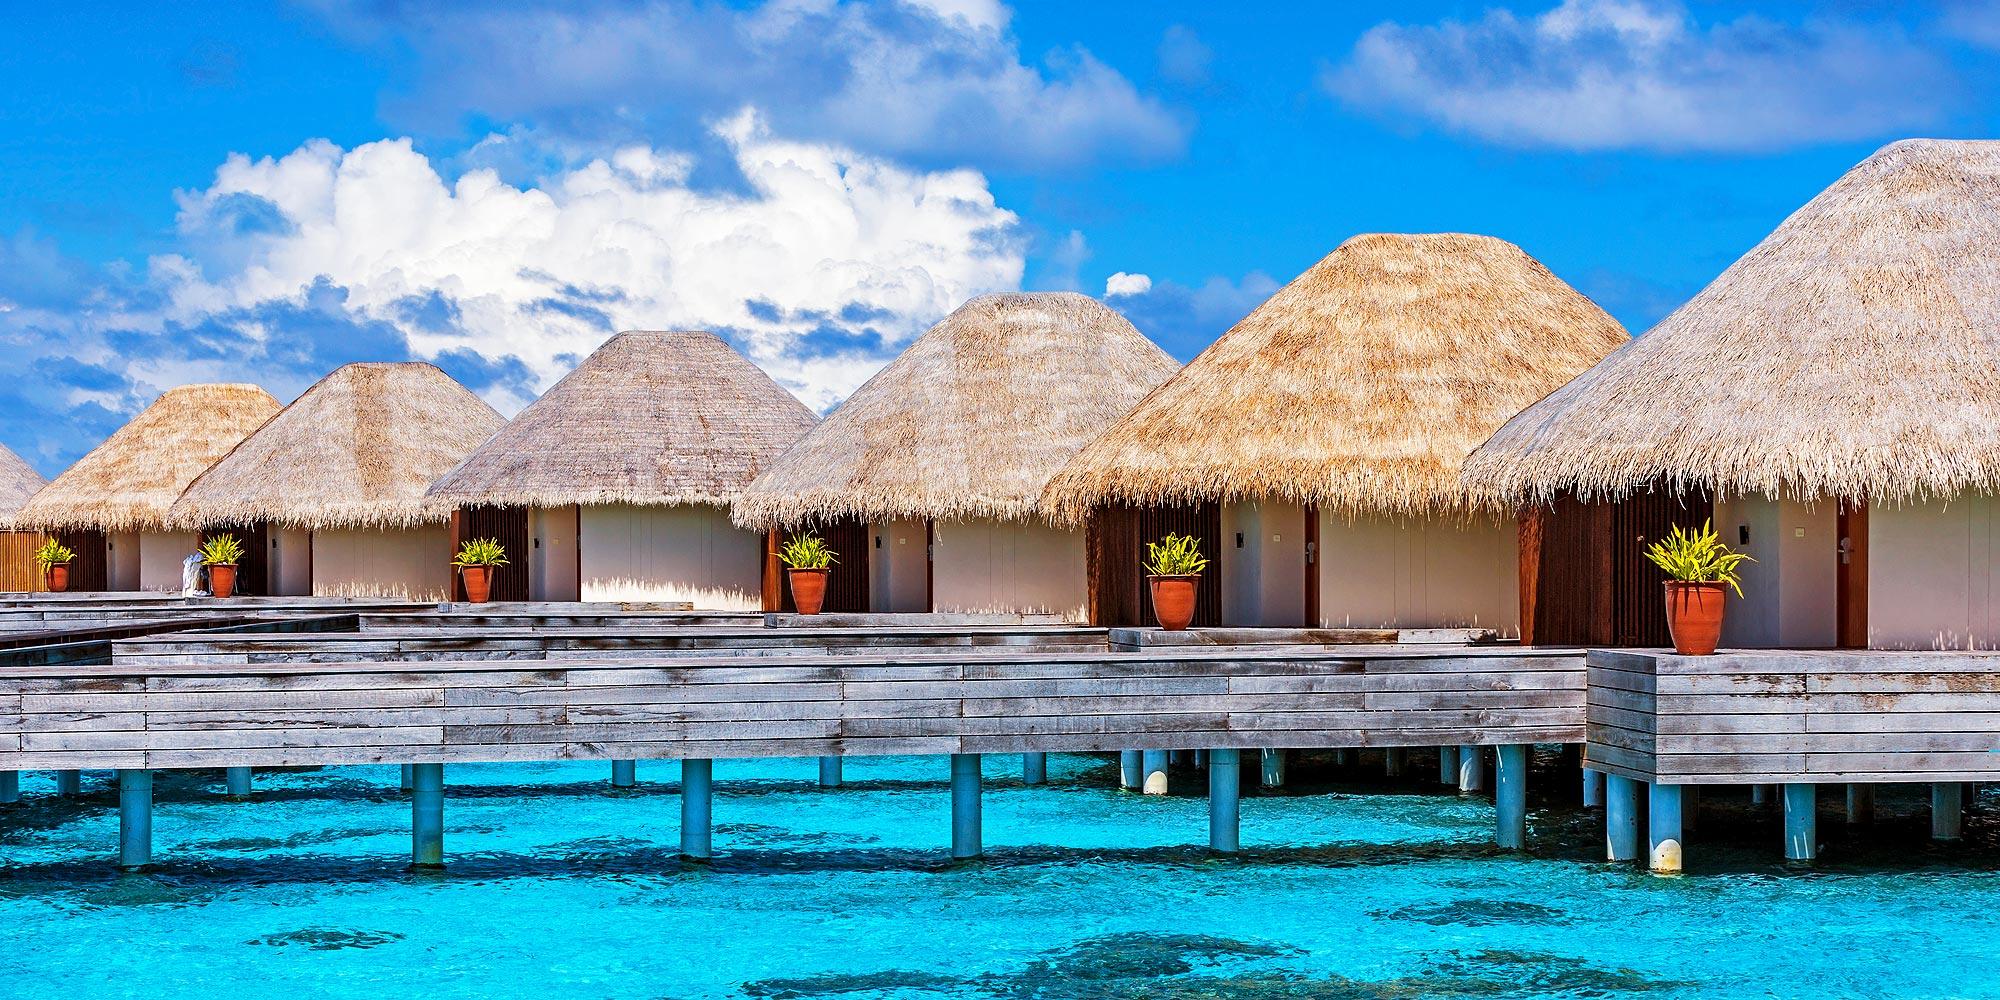 Maldives Holidays Travel Packages Qatar Airways Holidays